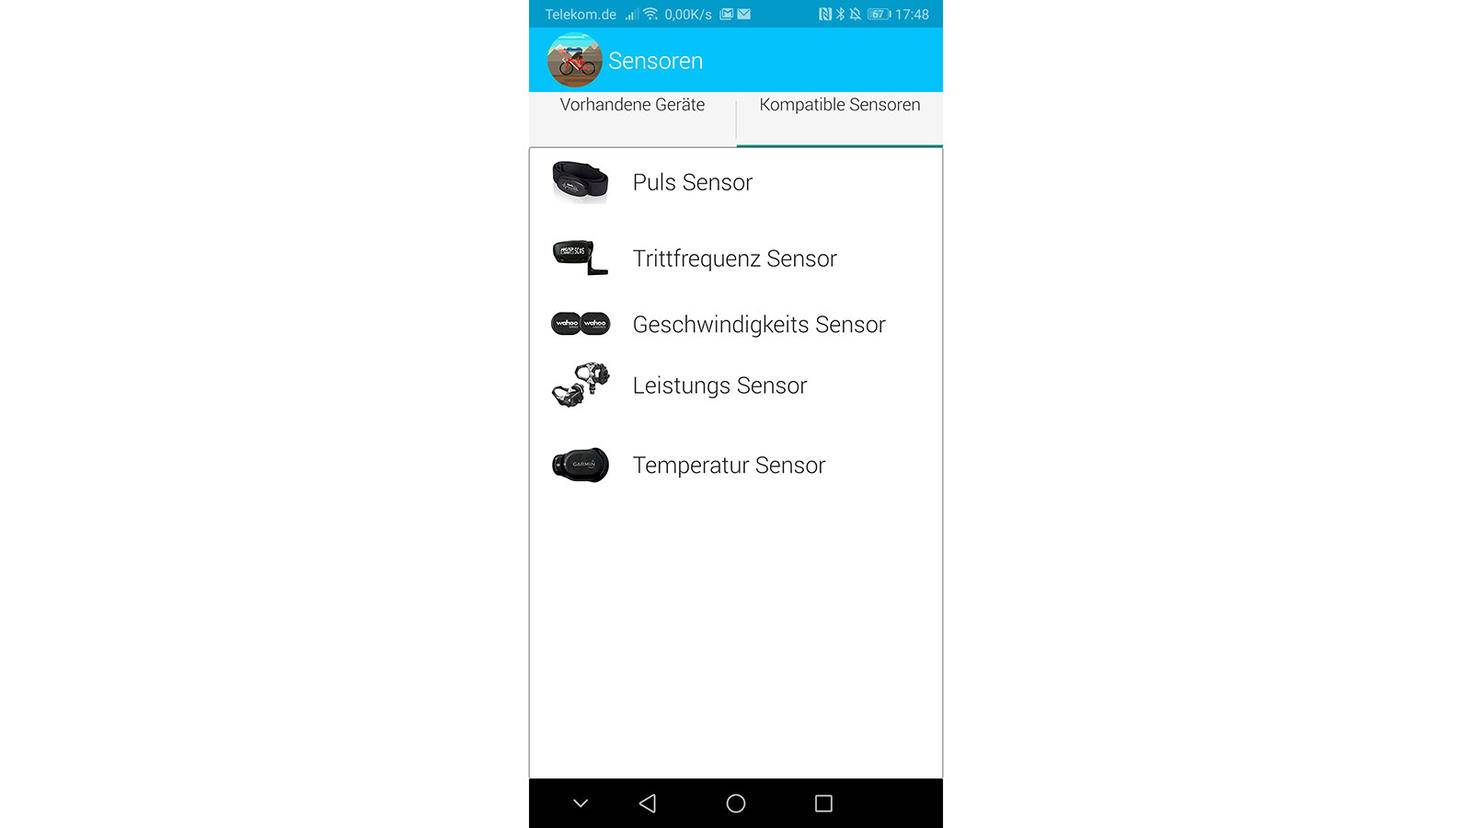 Sensoren konfigurieren bei BikeComputer Pro